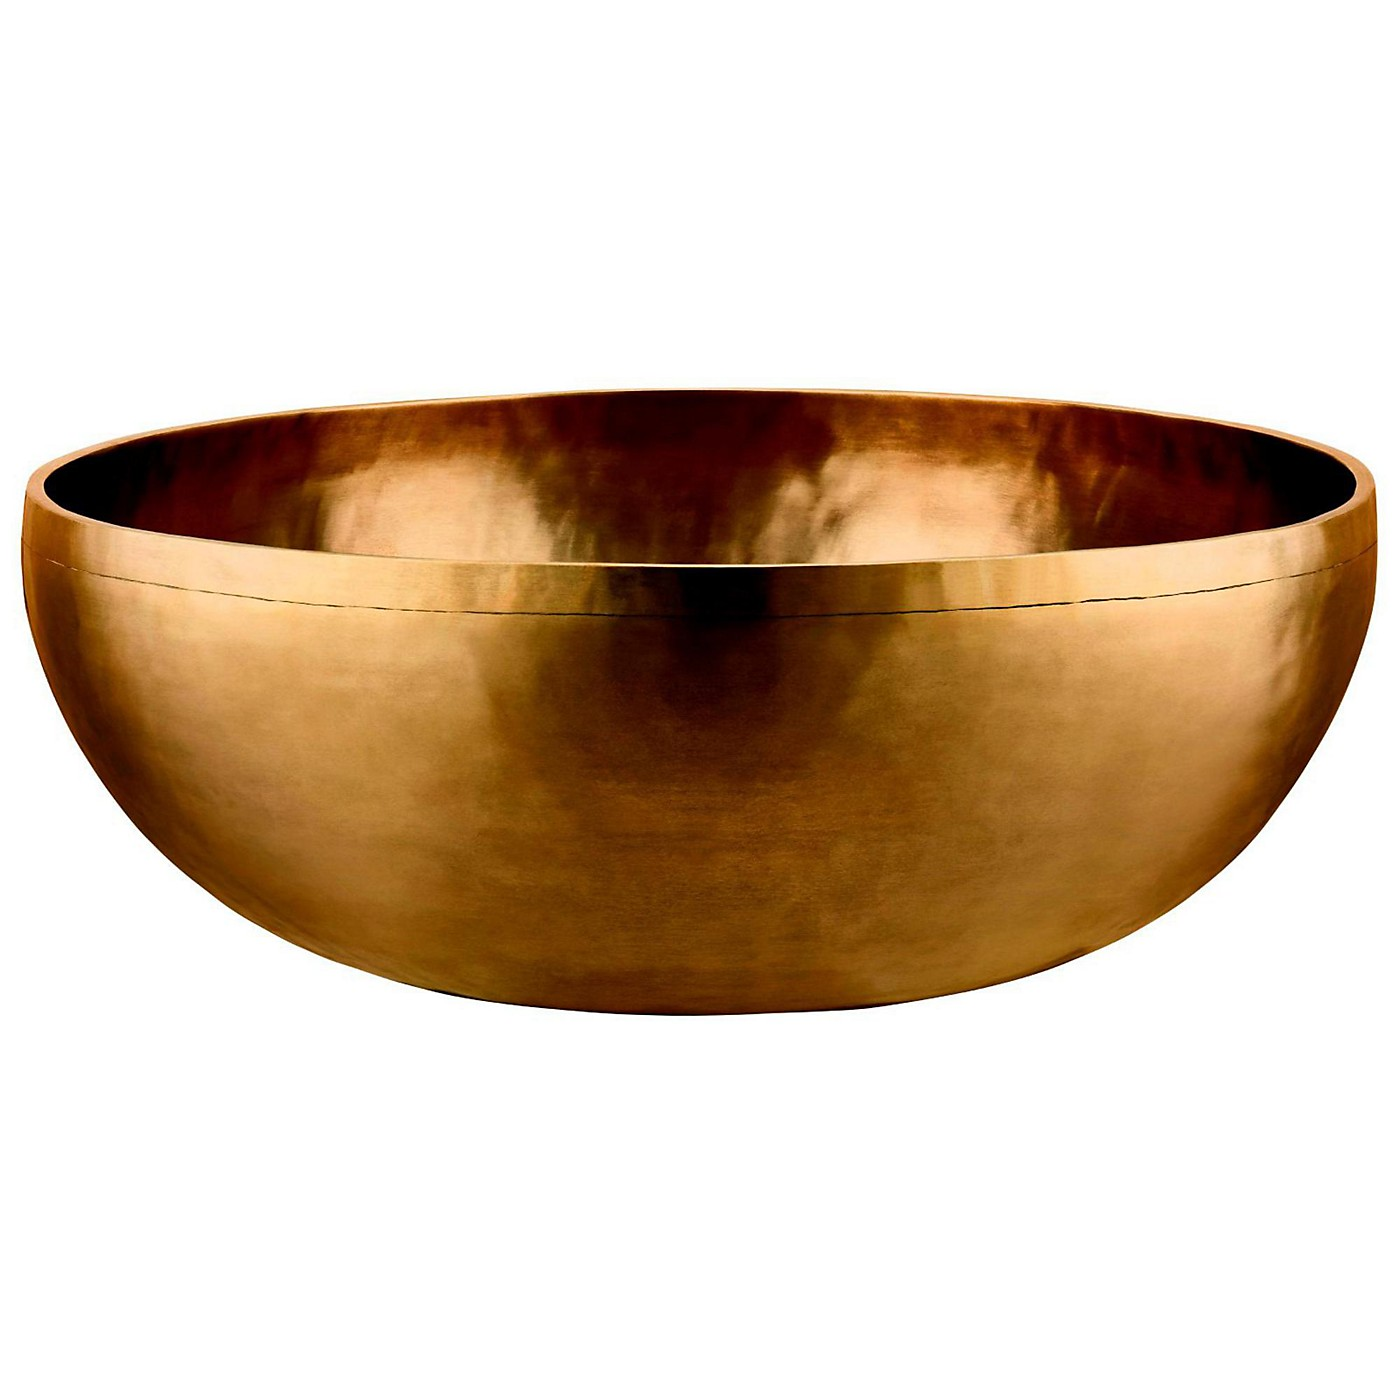 Meinl Giant Singing Bowl, 21.26